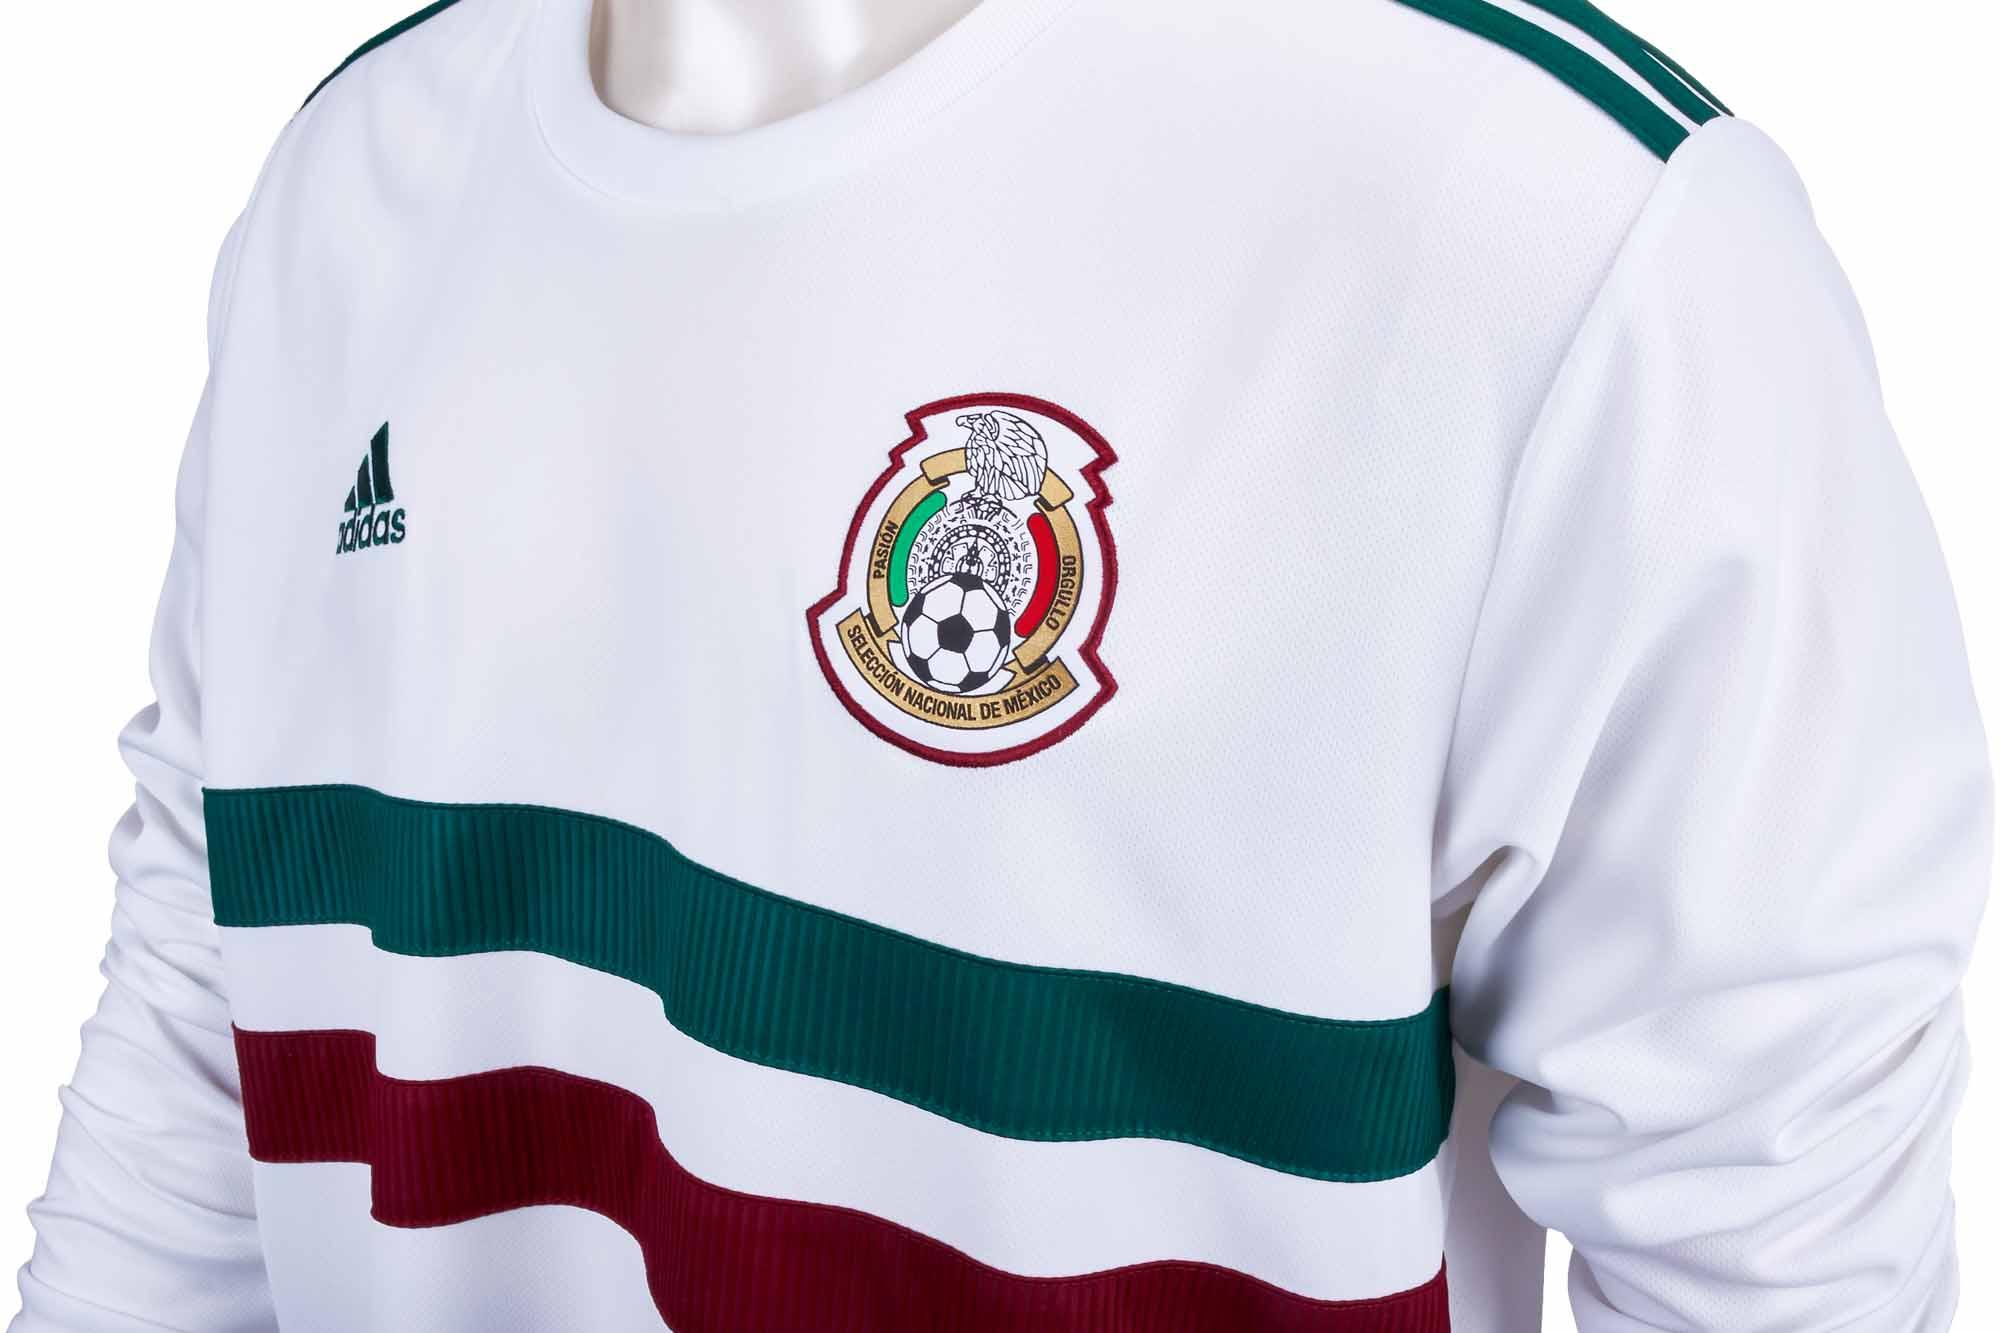 dad941f79f7 2018/19 adidas Mexico L/S Away Jersey - SoccerPro